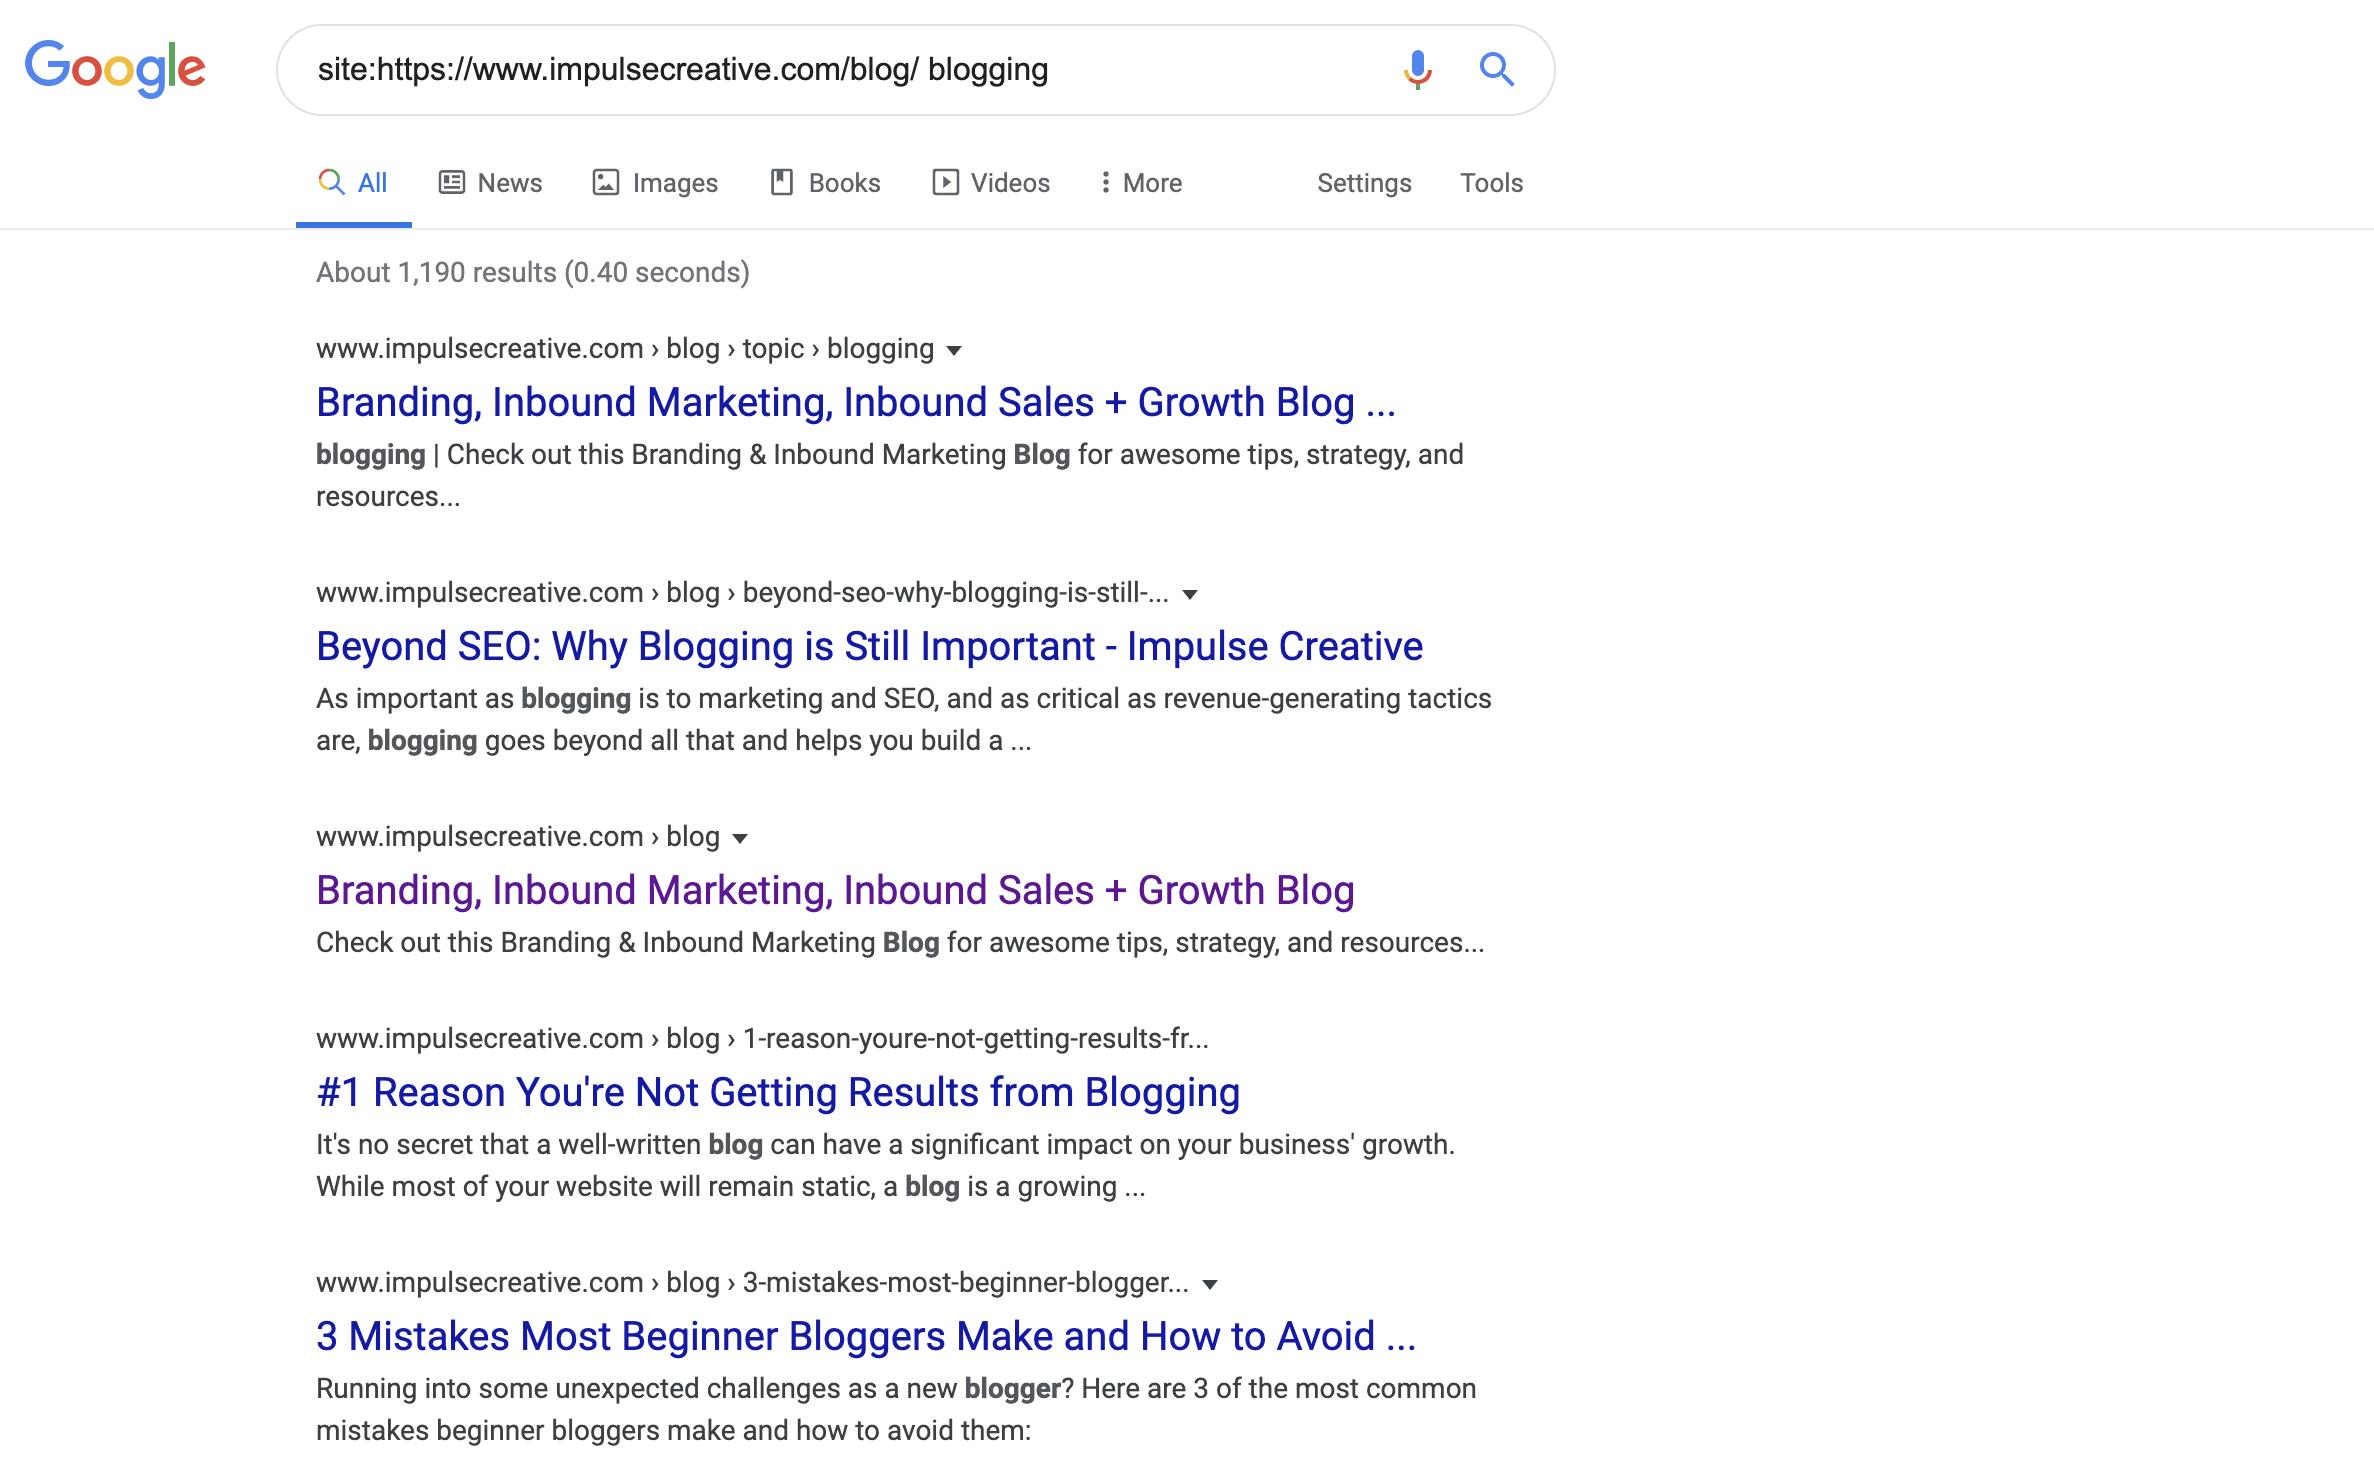 site-search-impulse-creative-blog-blogging-keywords